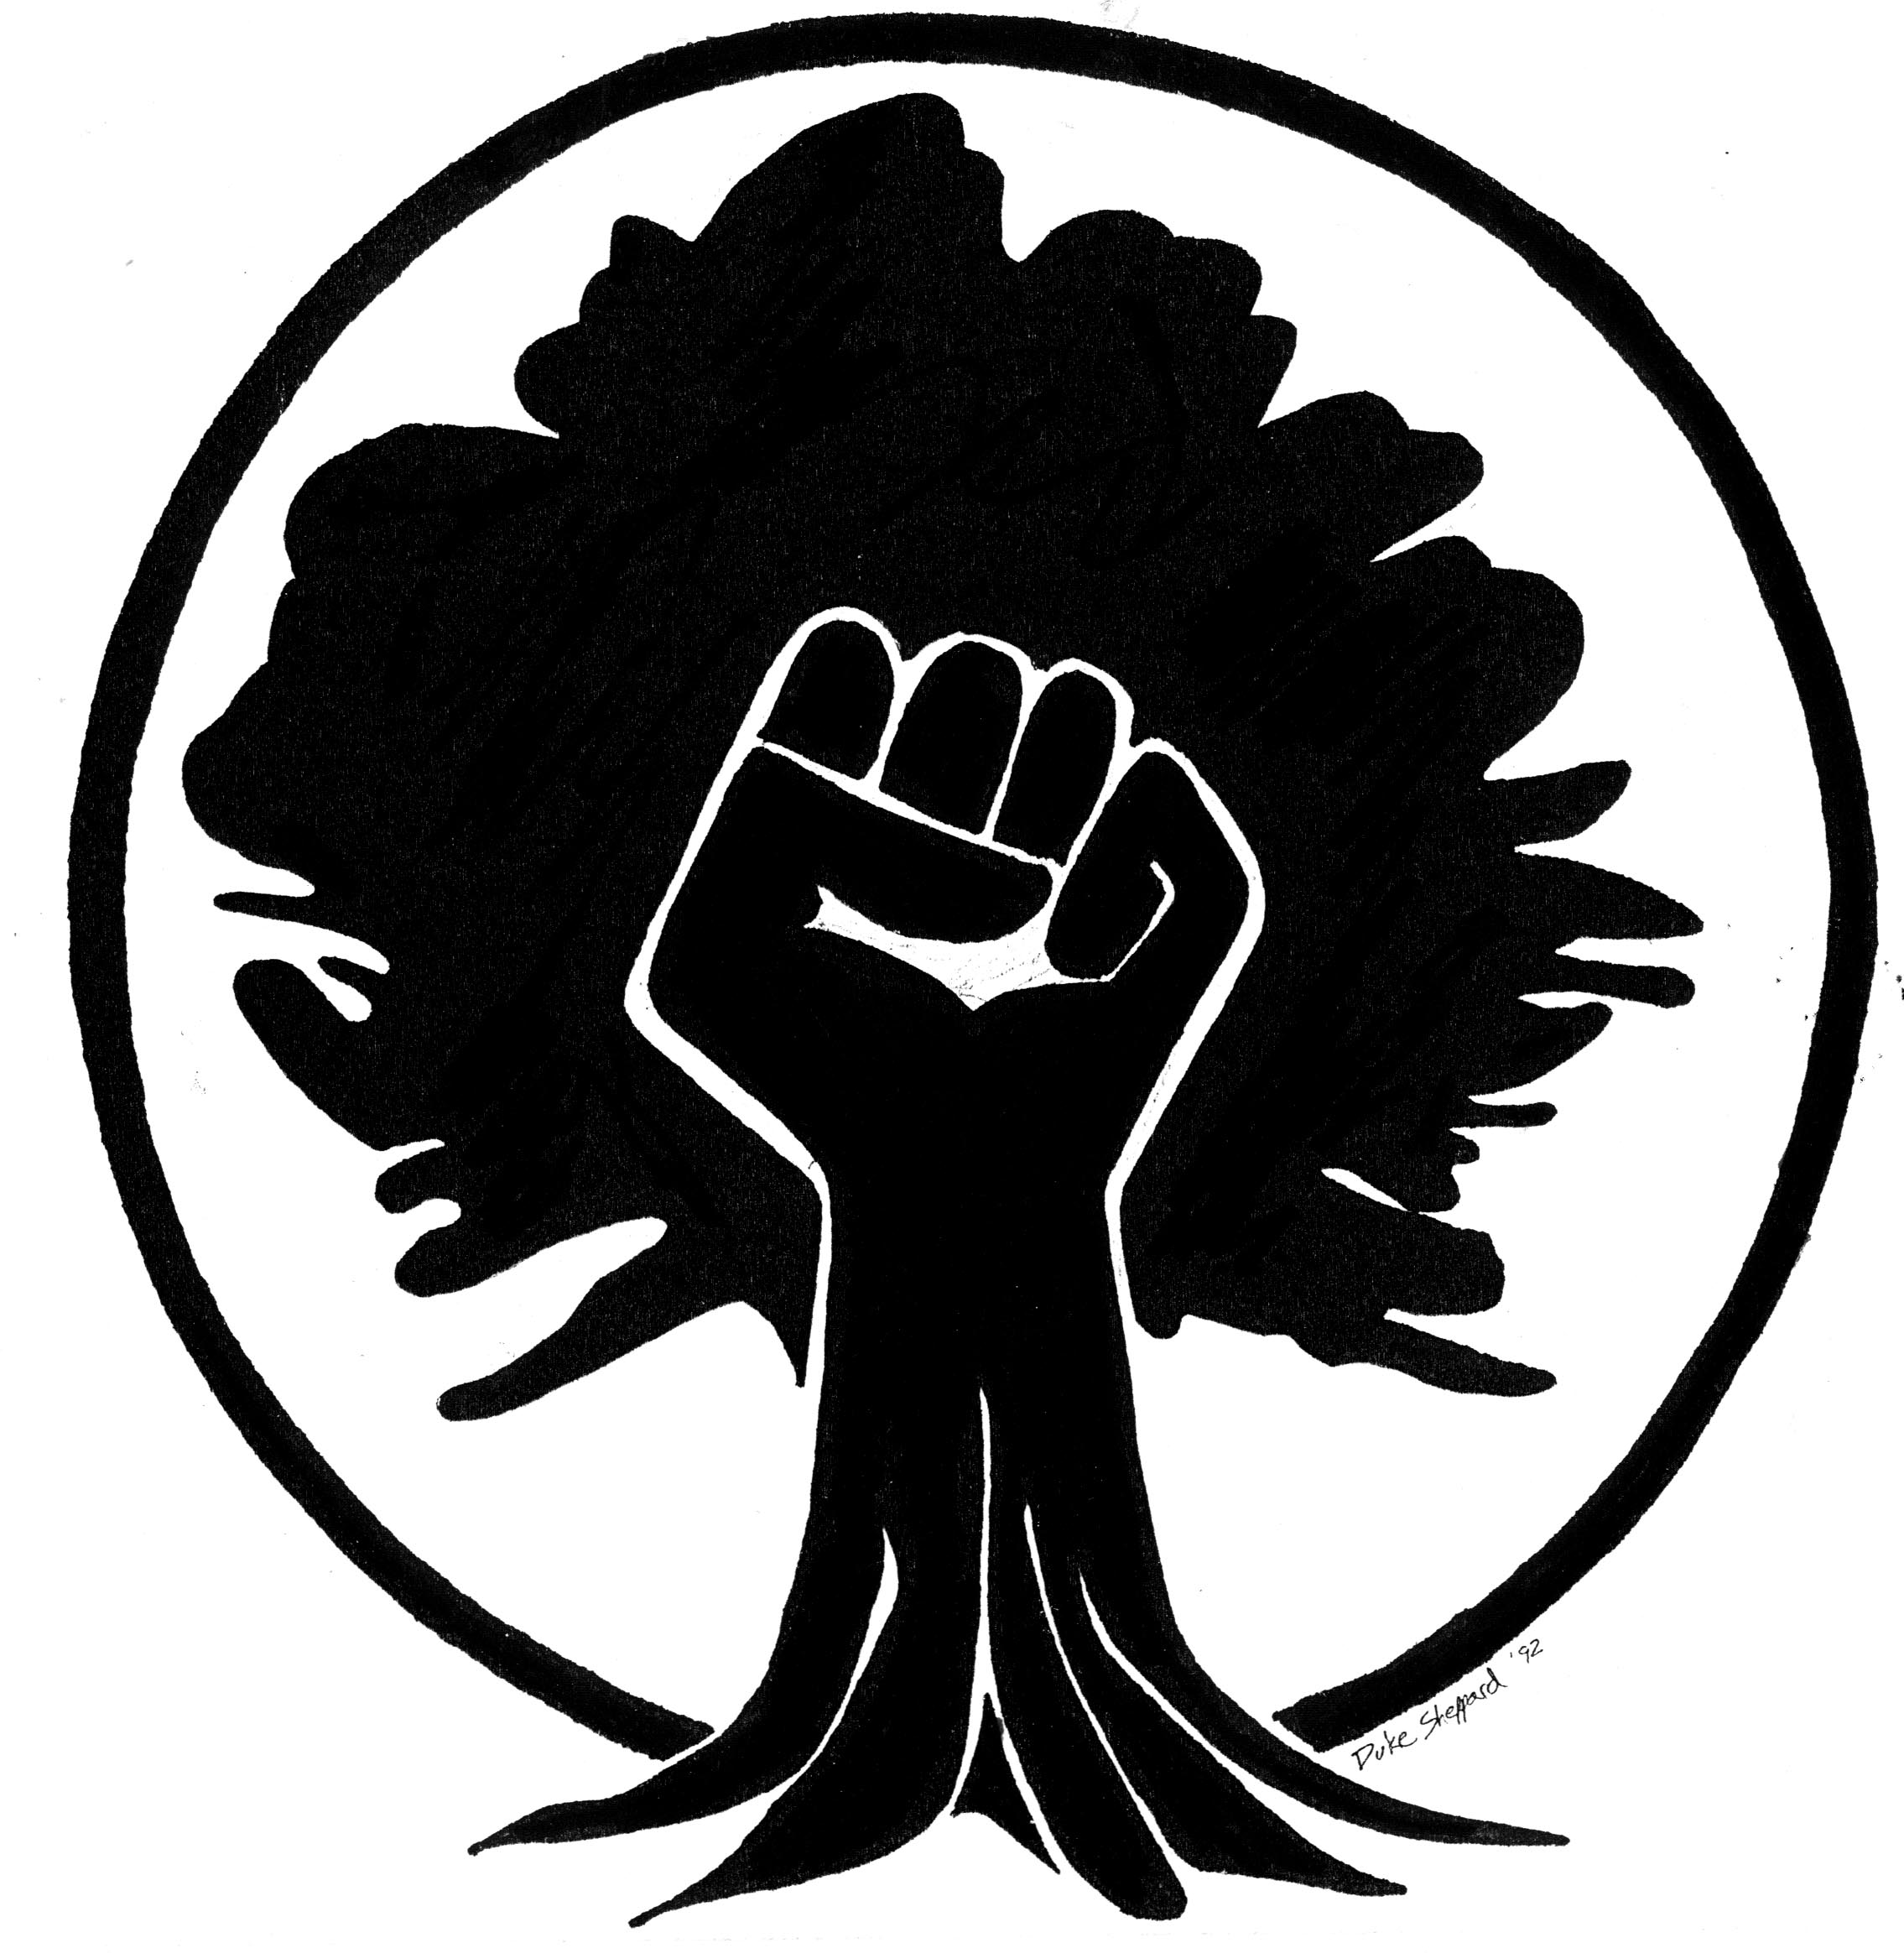 61b0f0733 Black power Logos